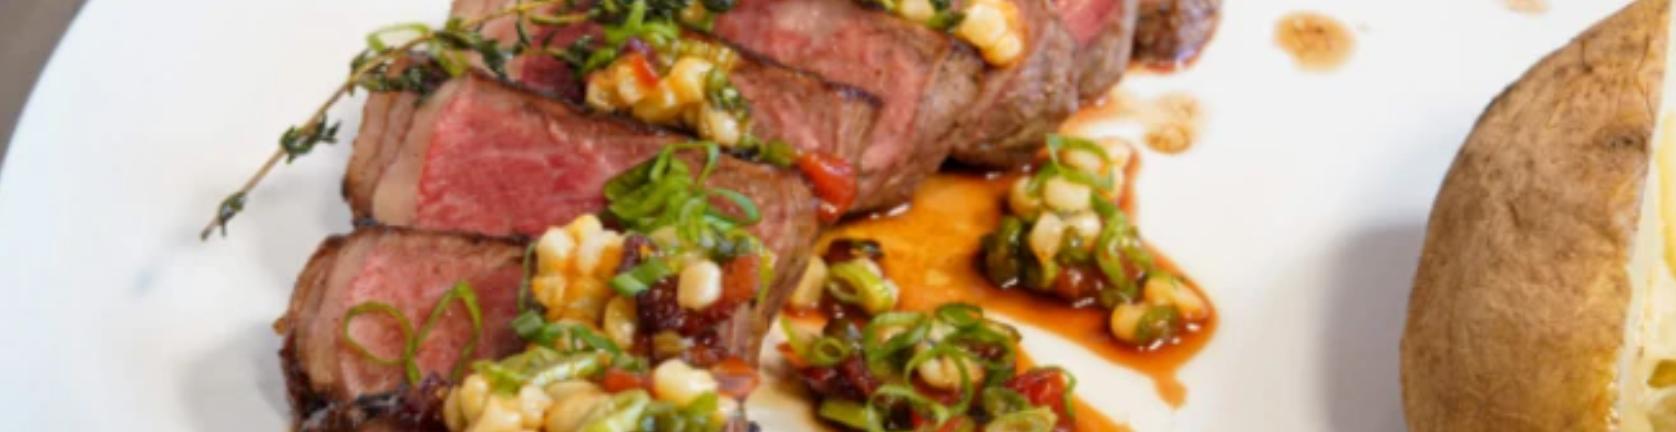 Image of Pan-Seared NY Strip Steak with Truffle Corn Succotash